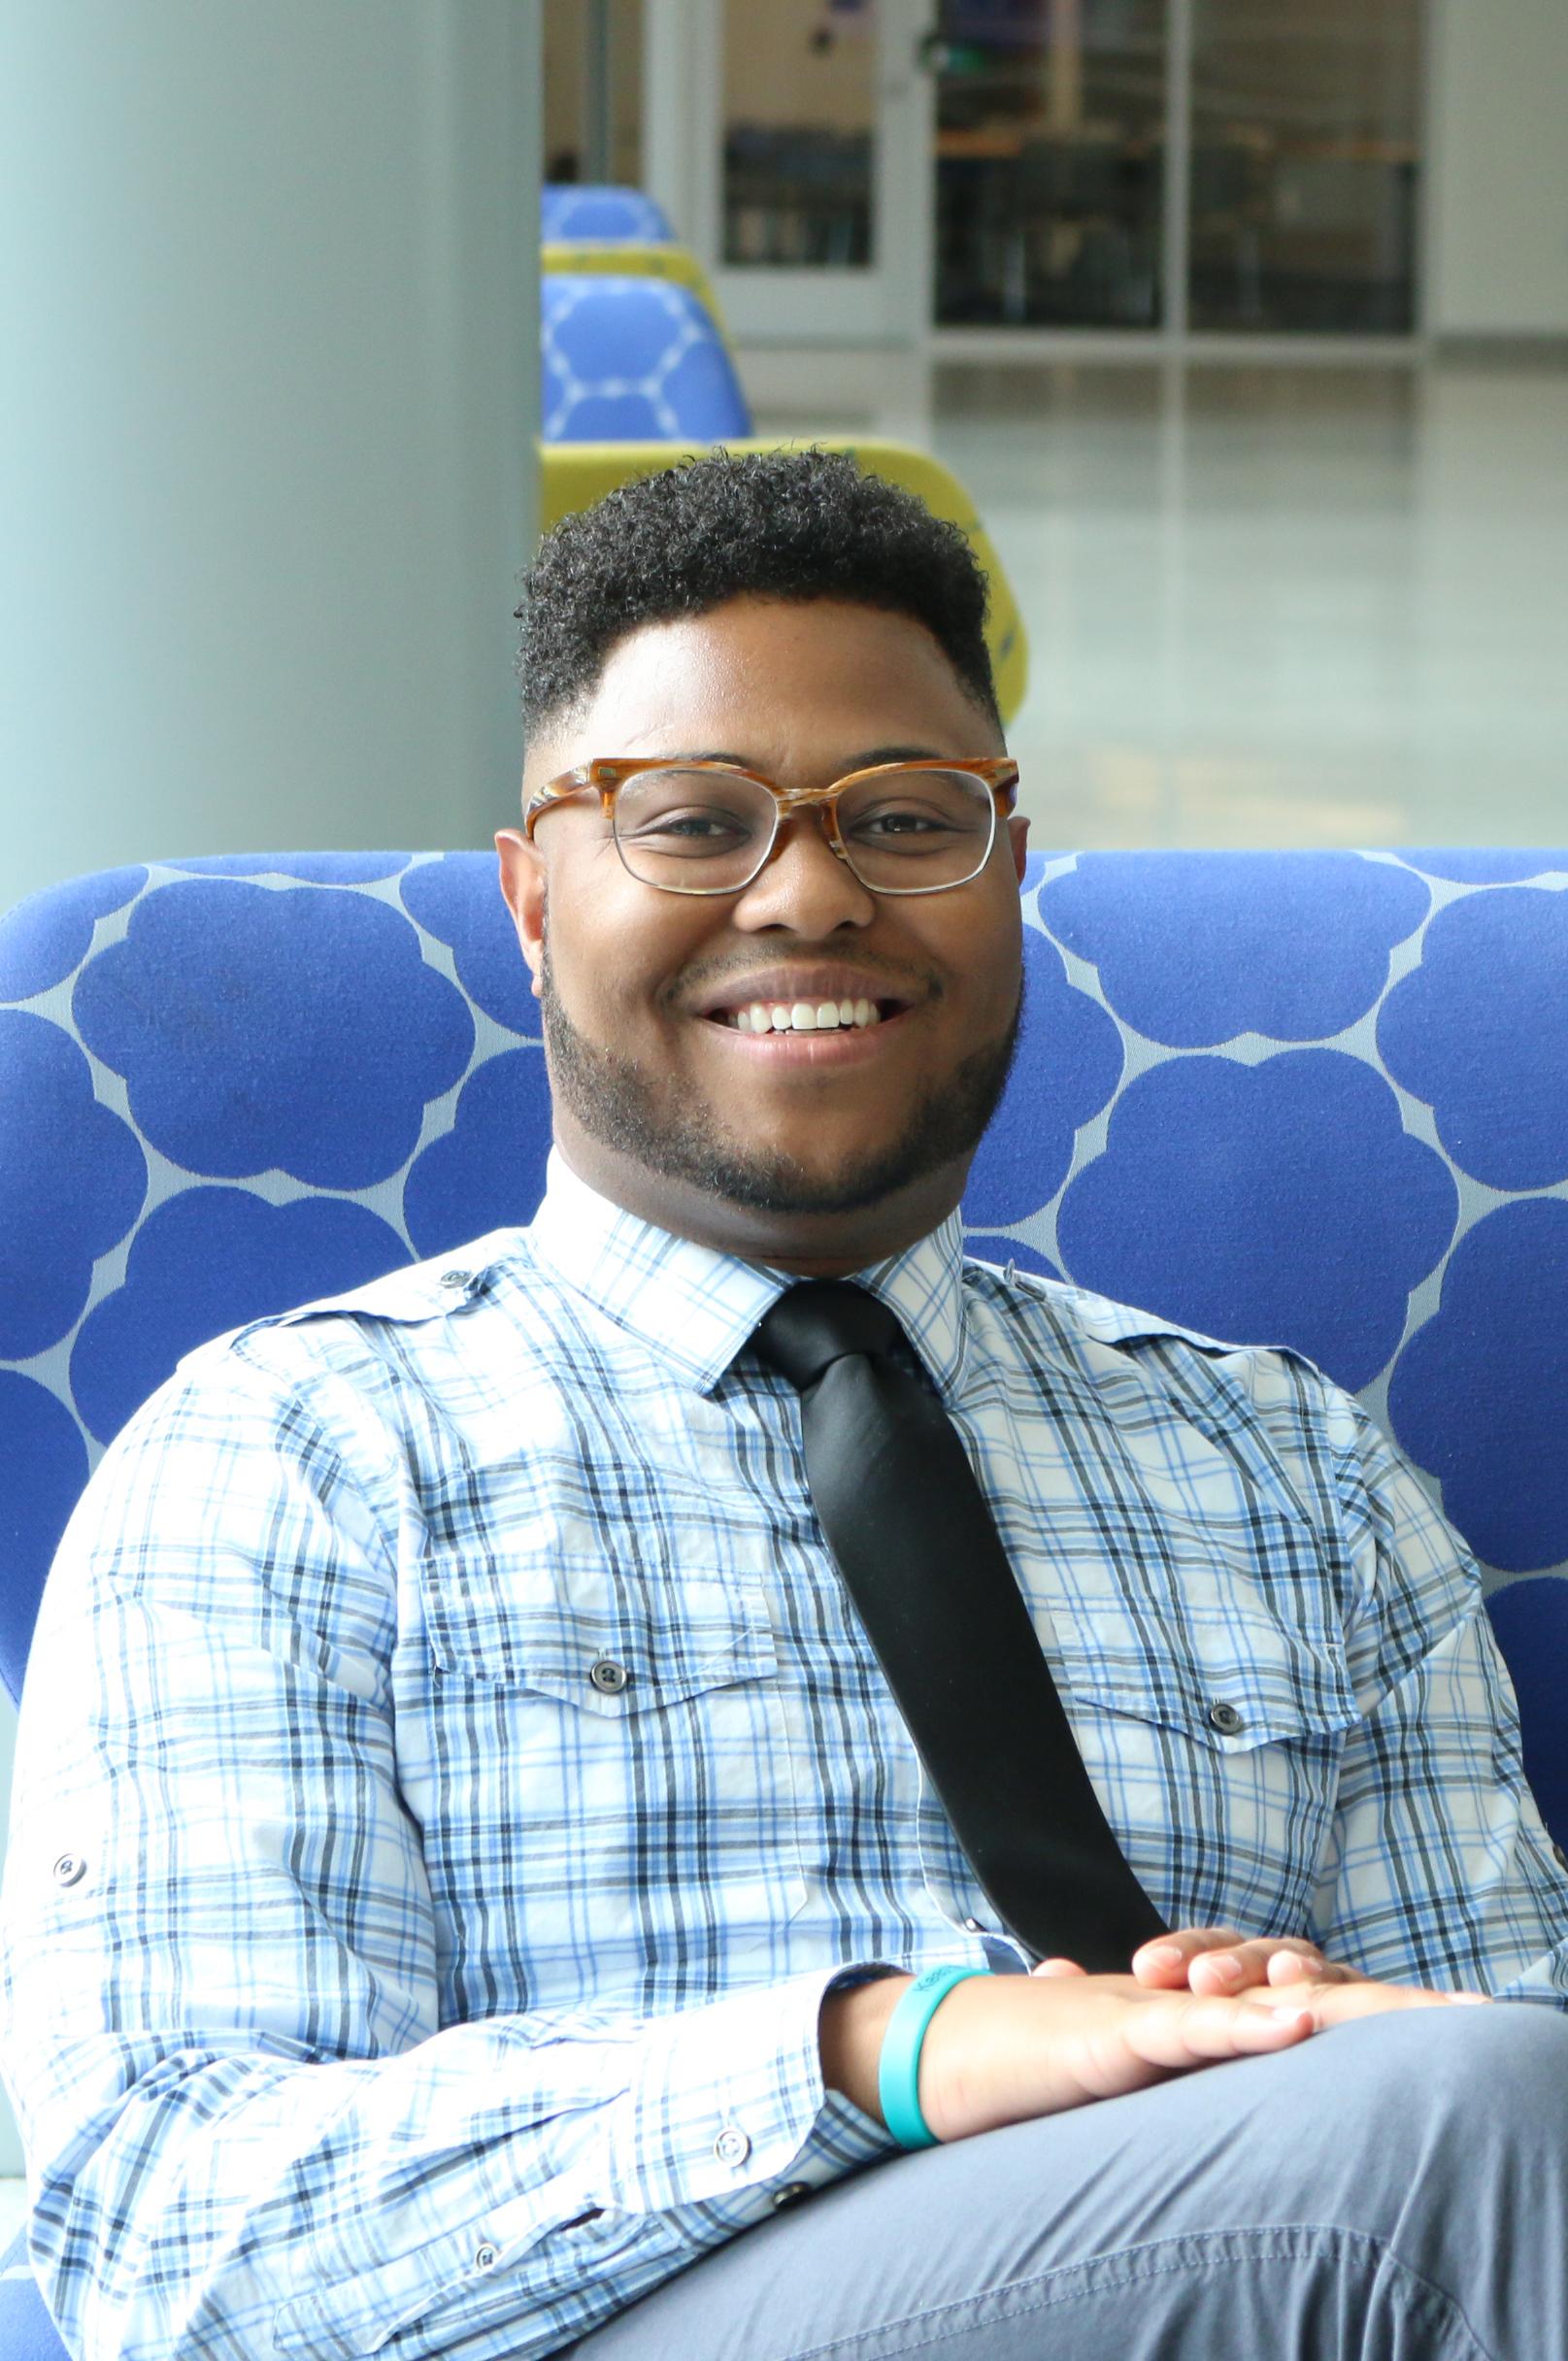 Daniel Beasley, social work student